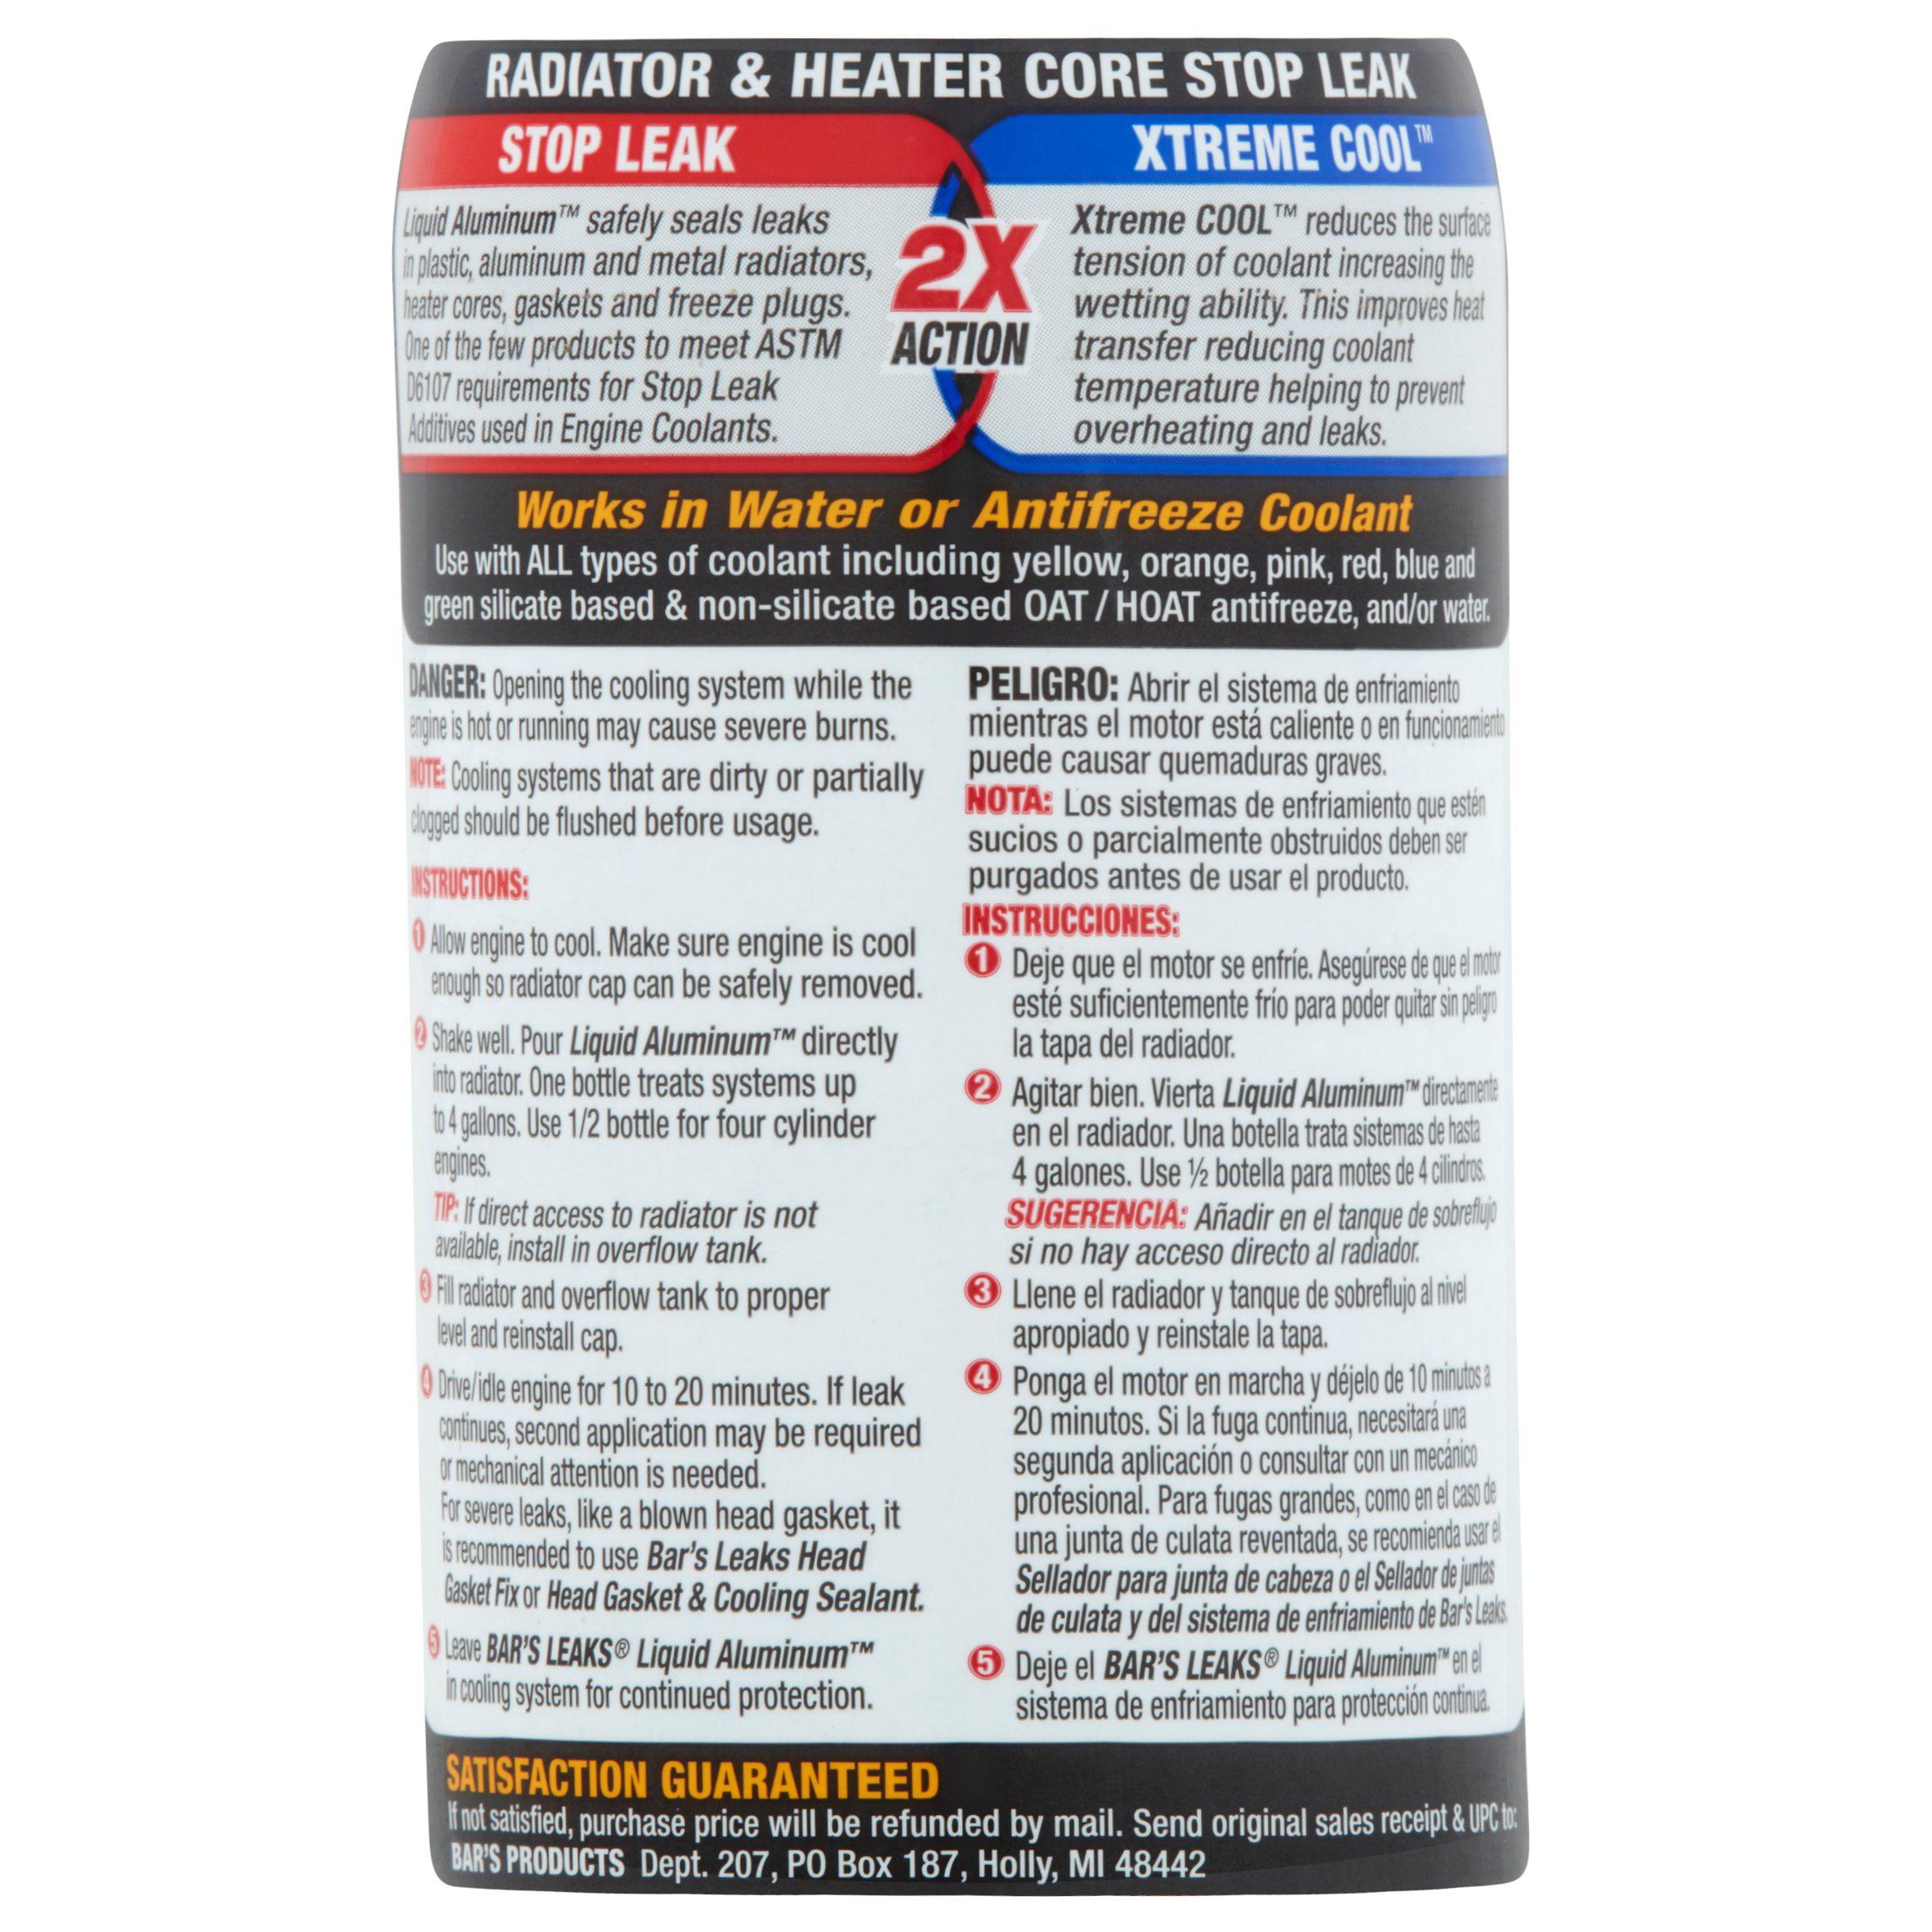 Bar's Leaks Liquid Aluminum Radiator & Heater Core Stop Leak